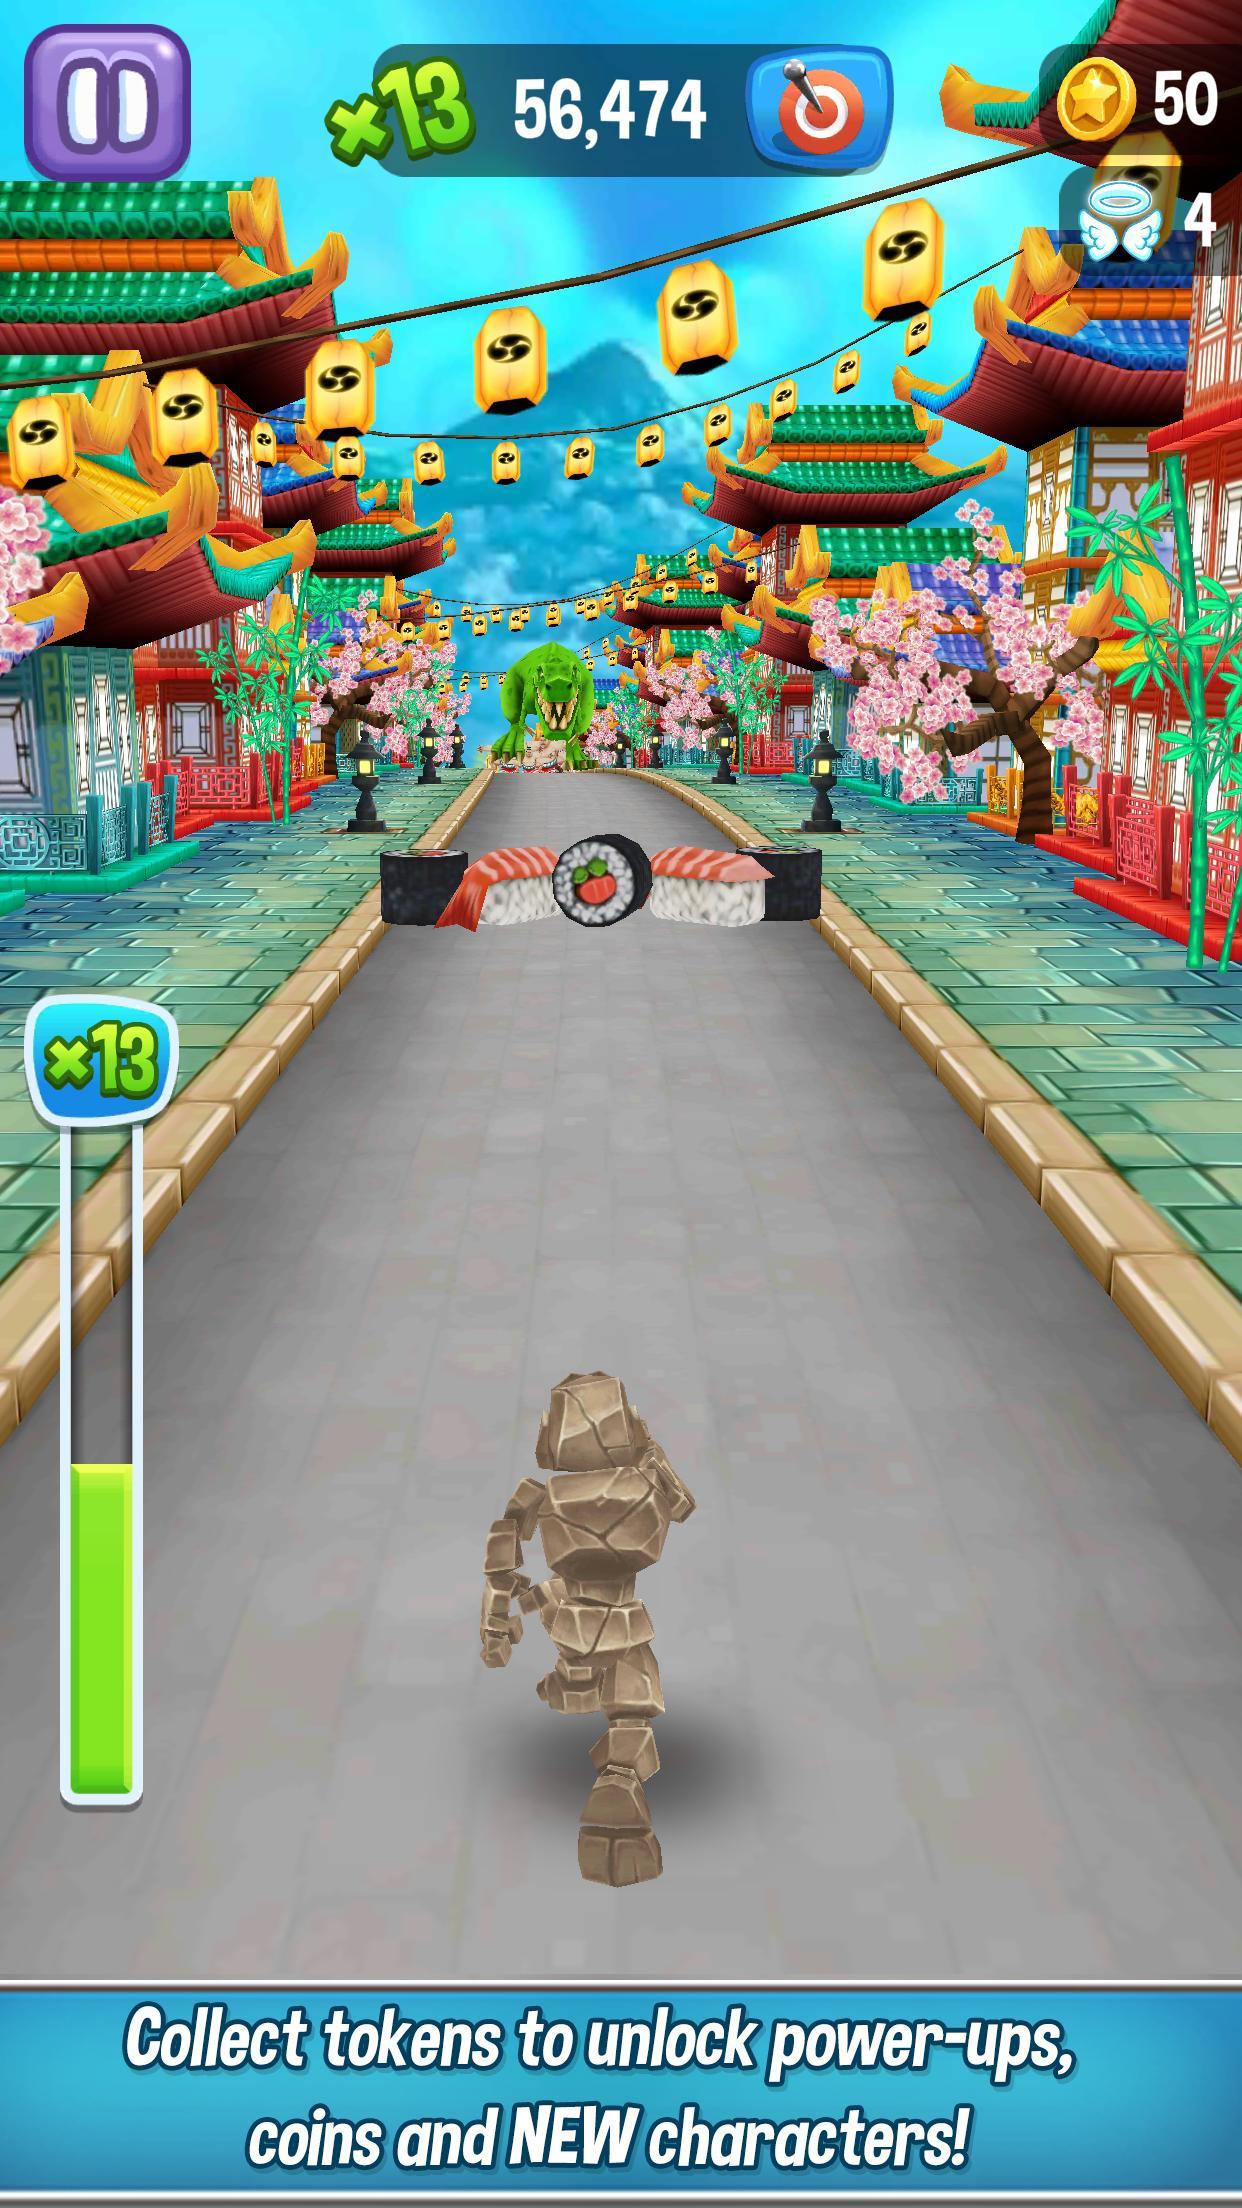 Angry Gran Run Running Game 2.12.1 Screenshot 4